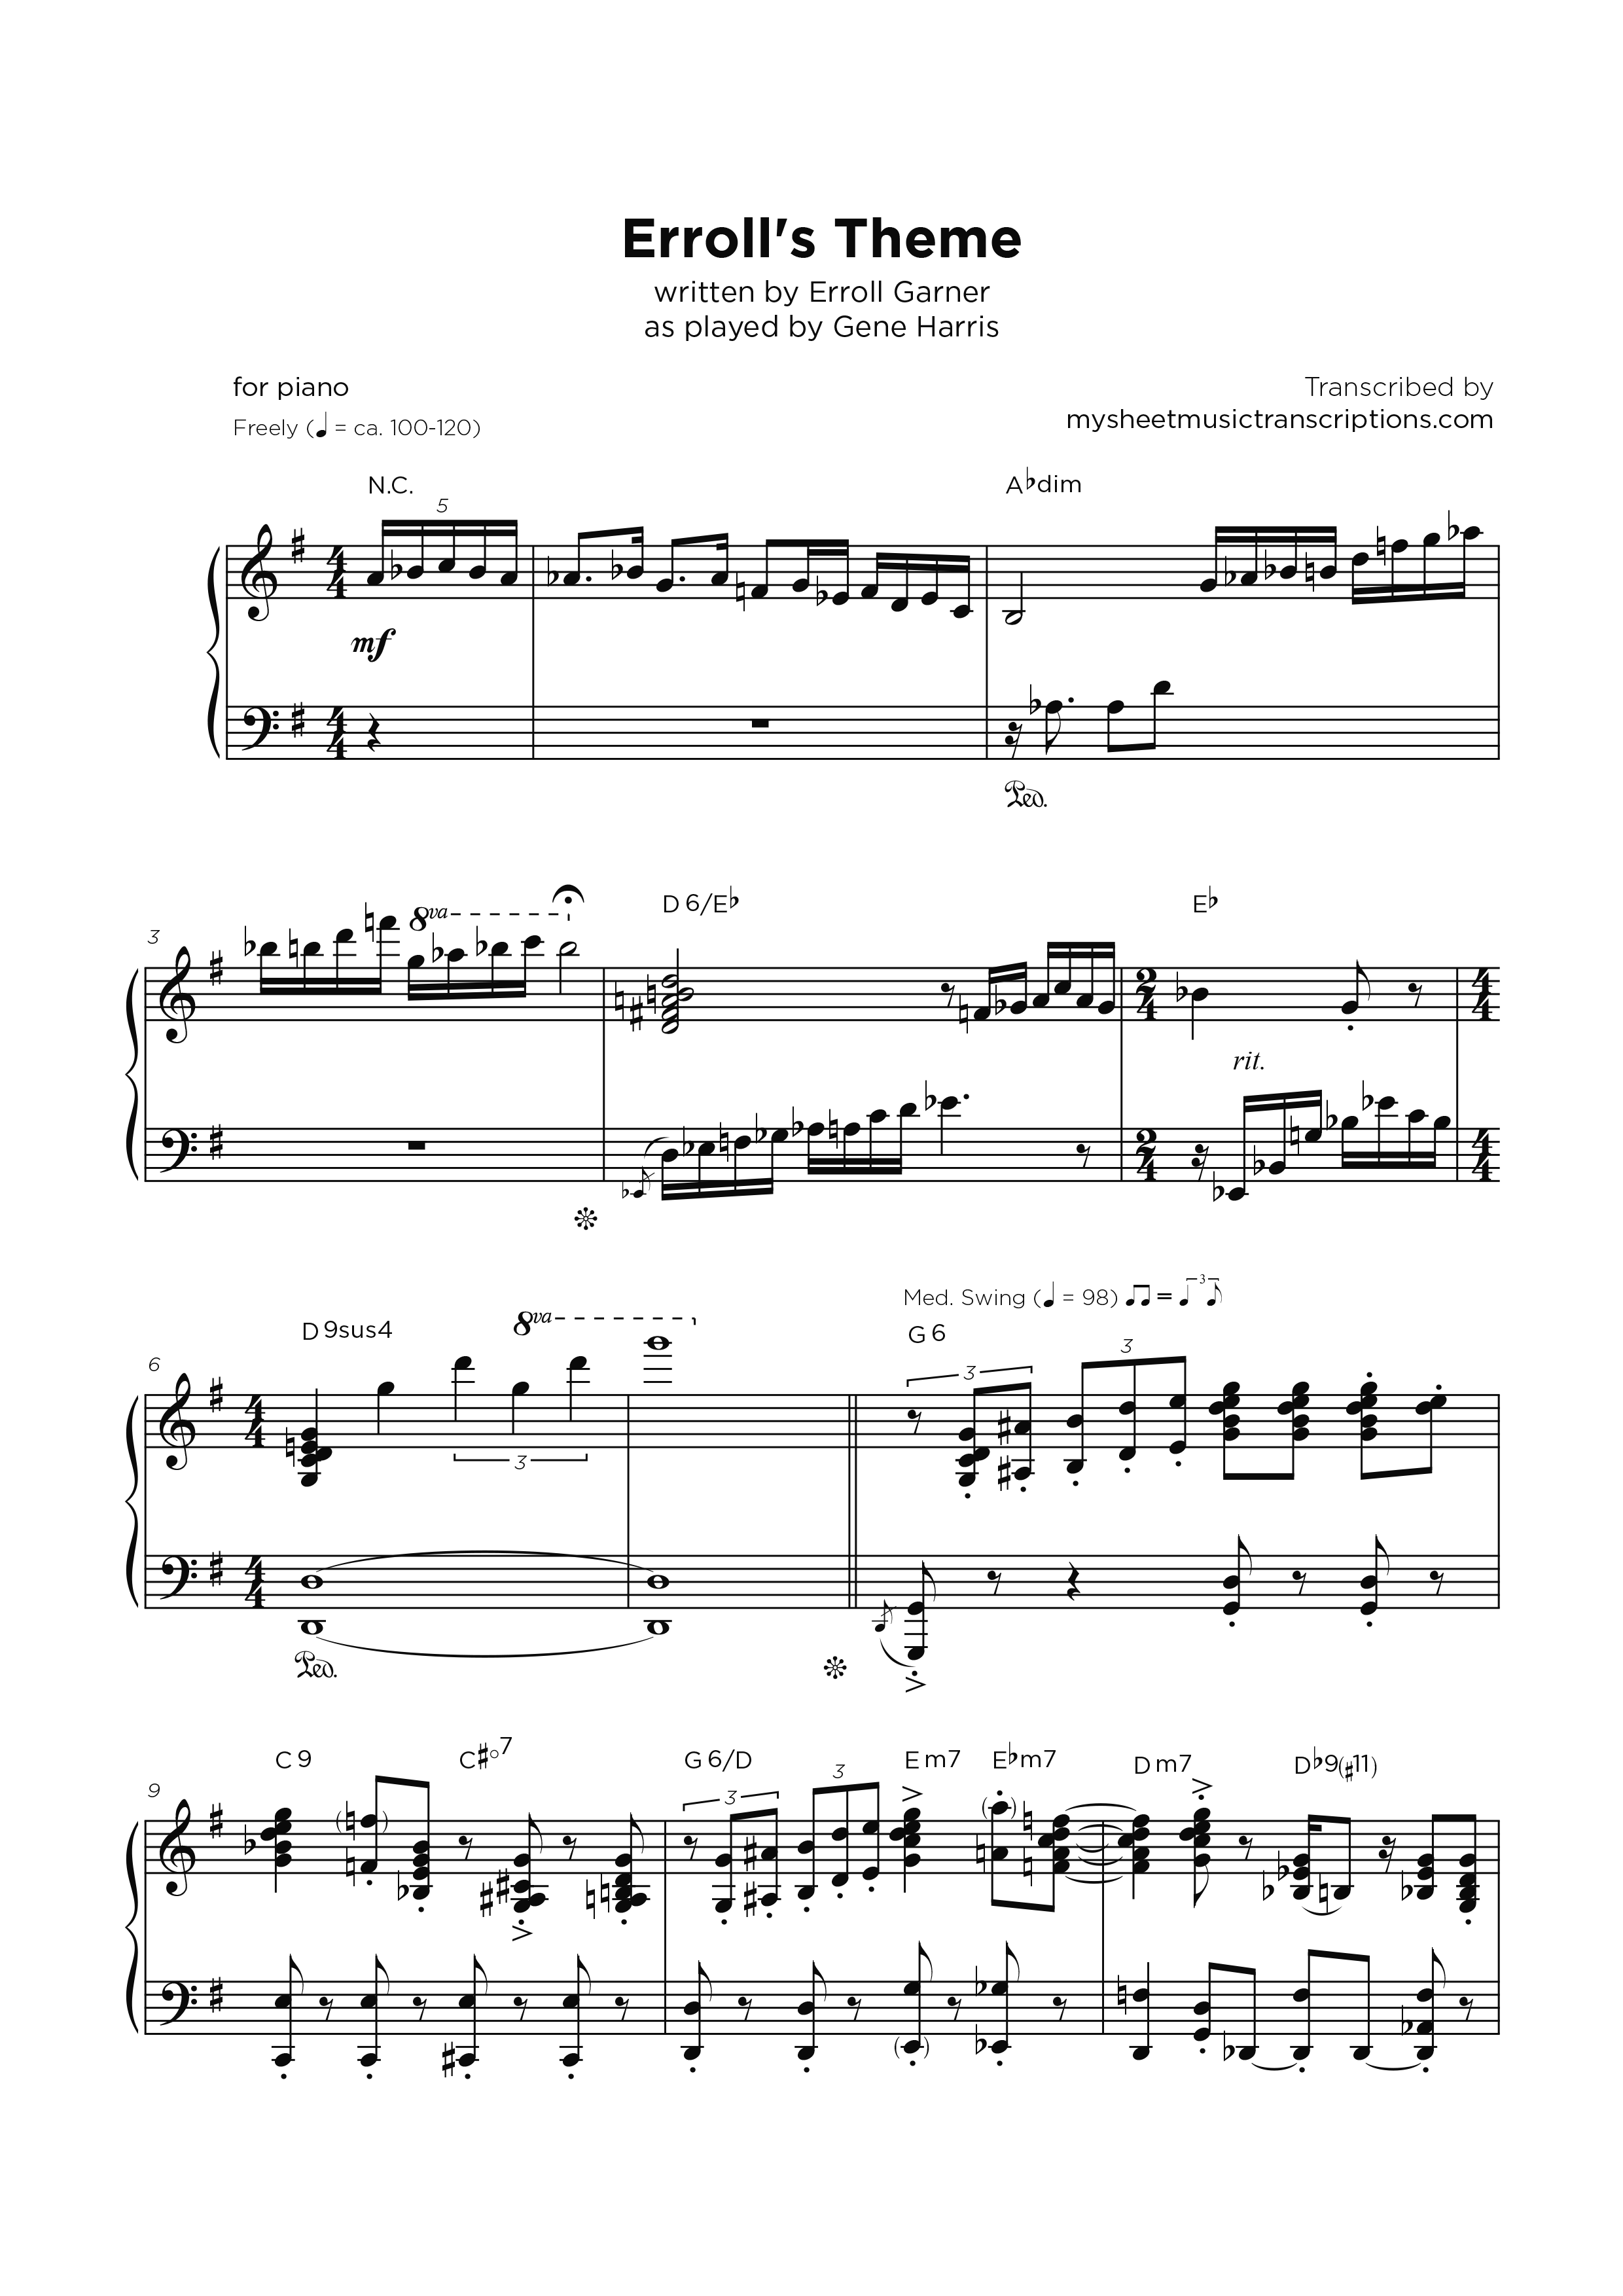 Erroll's Theme as played by Gene Harris - Transcripción de partitura para piano jazz